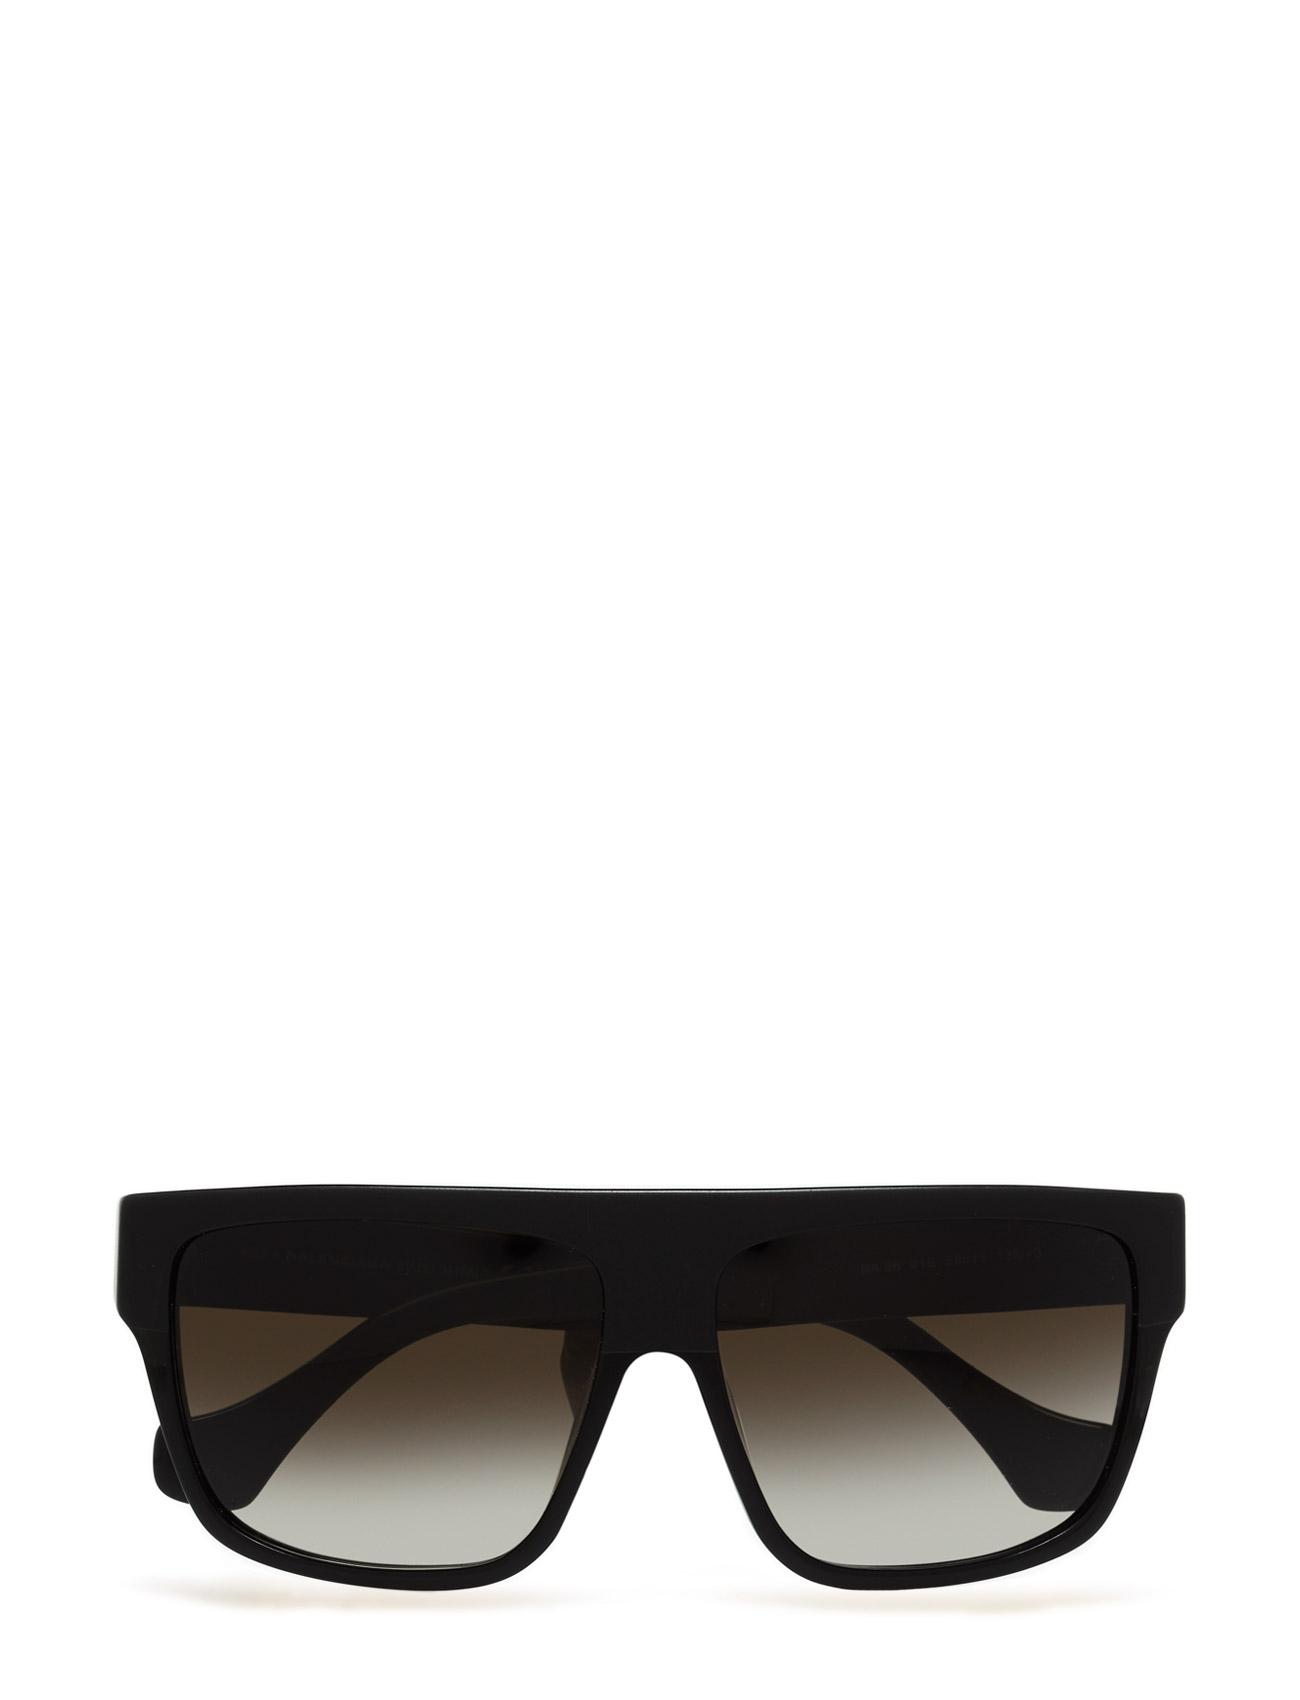 Ba0056 BALENCIAGA Sunglasses Solbriller til Damer i